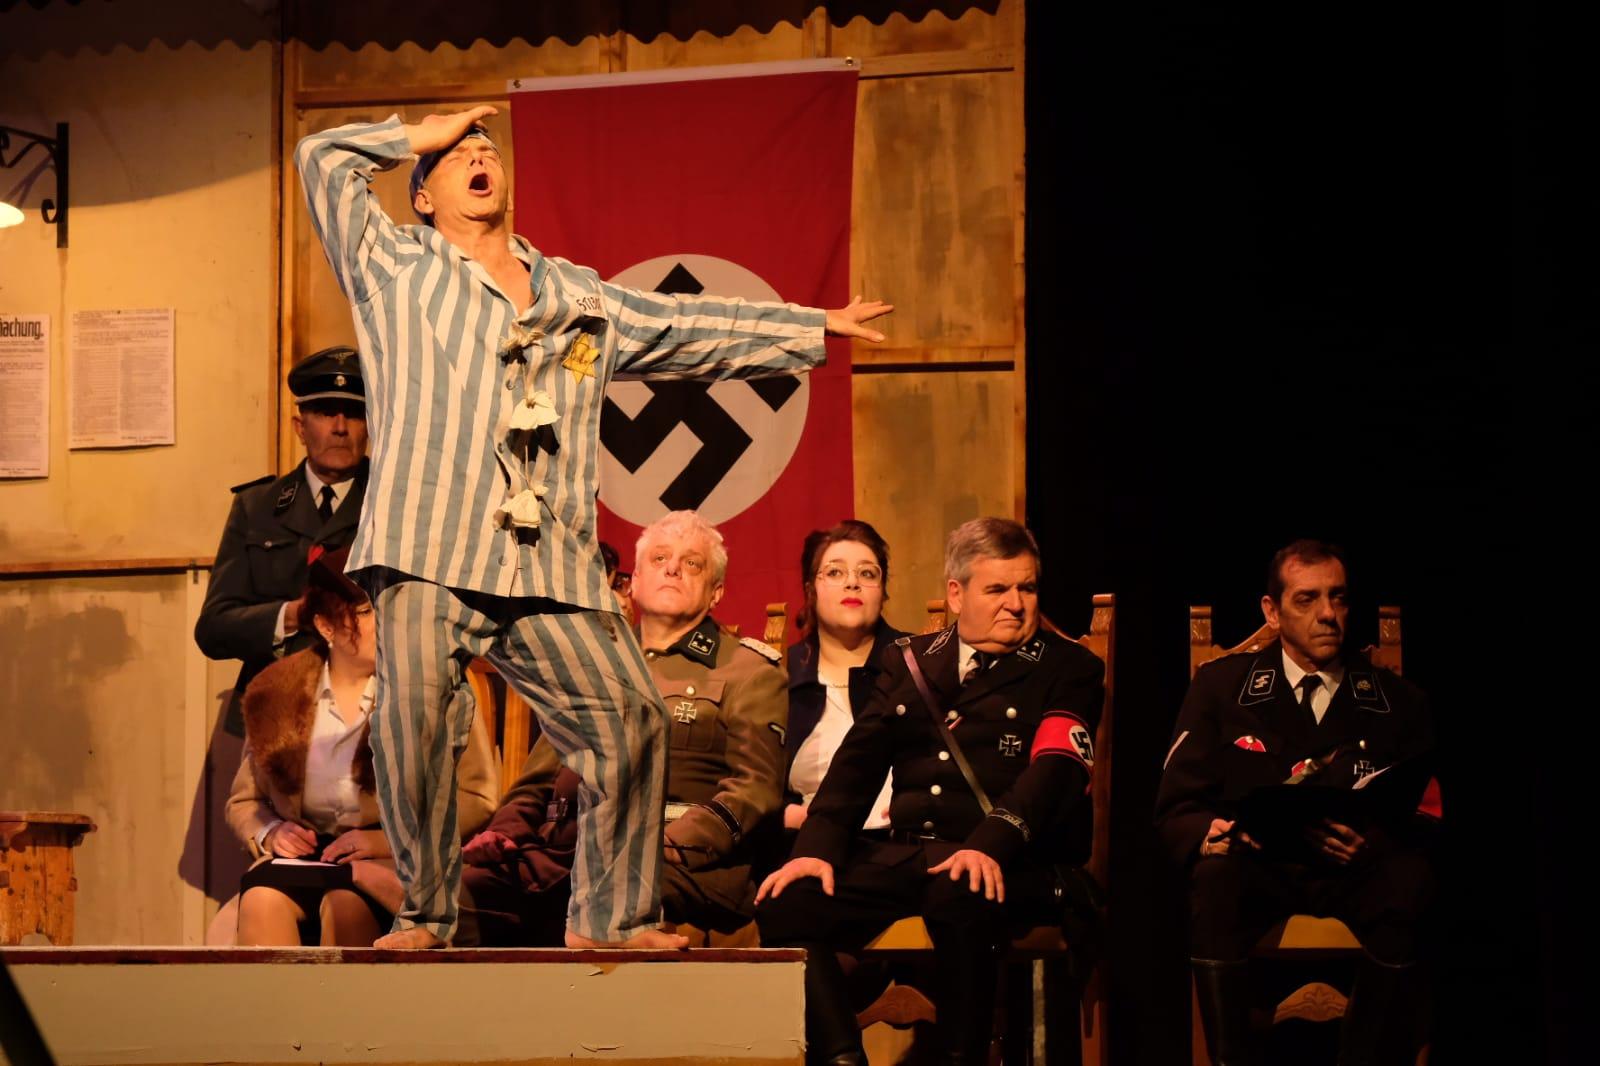 La follia del teatro nel teatro